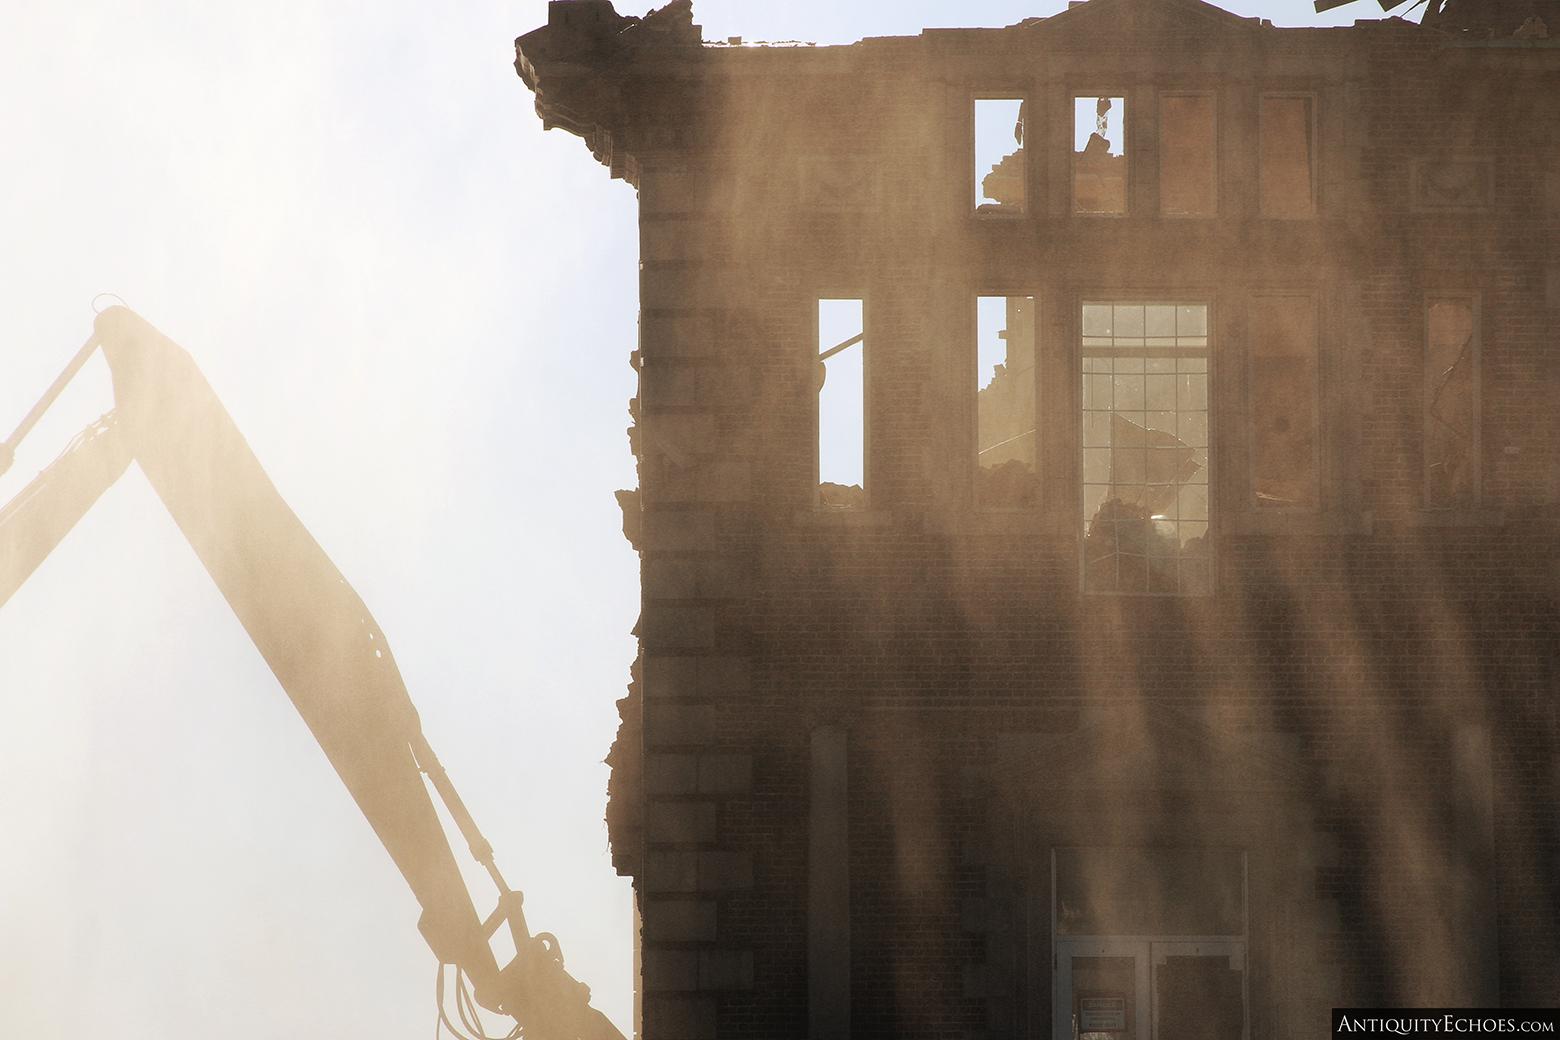 Allentown State Hospital - Demolition - Sunbeams and Debris